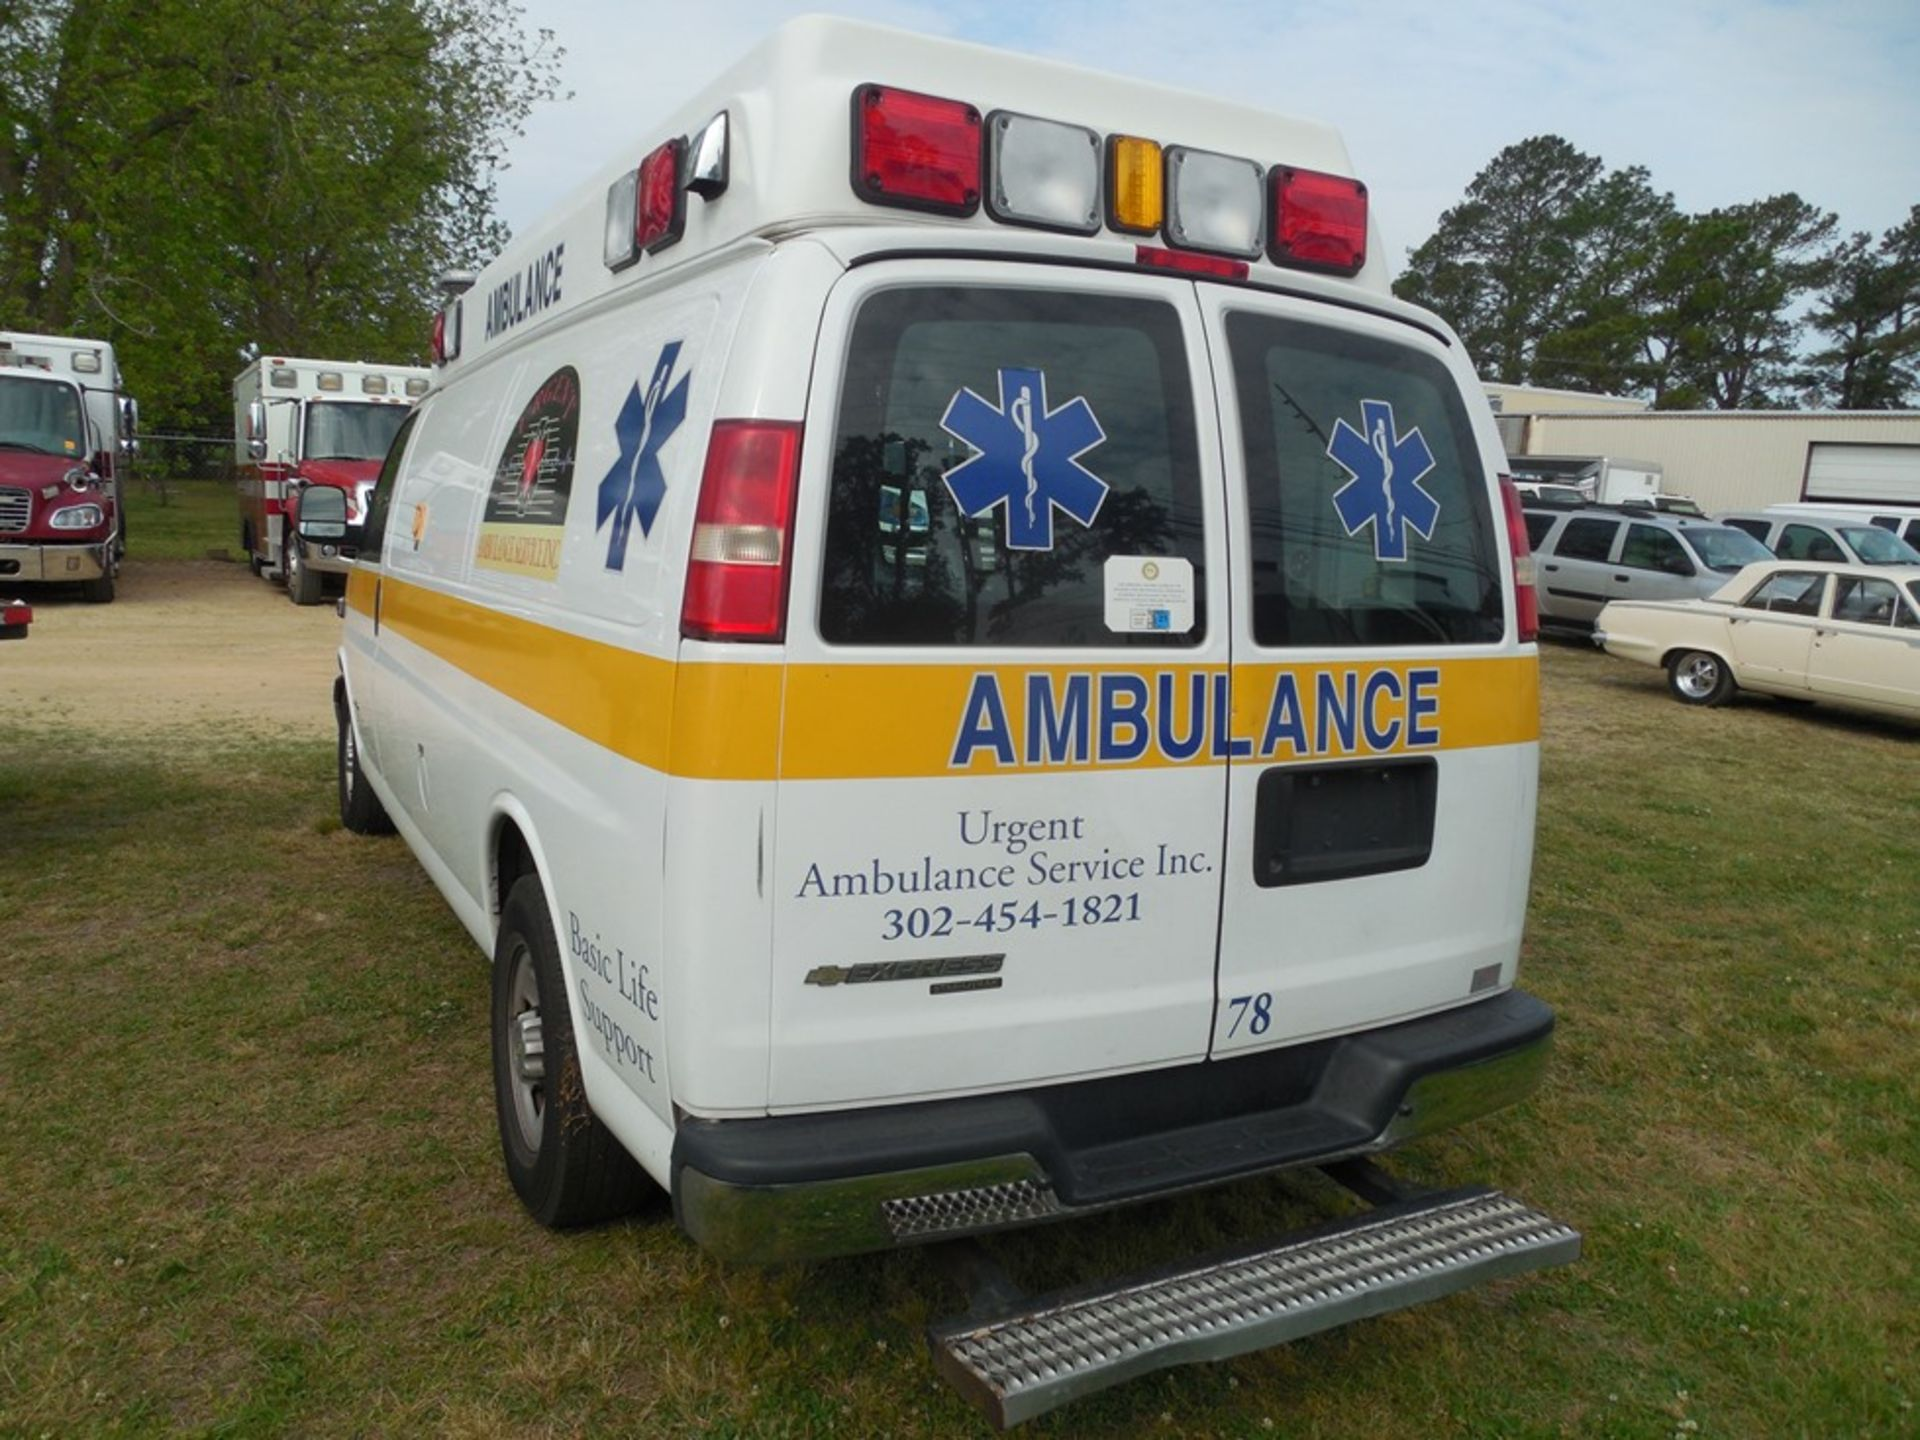 2014 Chev van ambulance dsl, 172,472 miles, vin# 1GBZGUC19E1162022 - Image 5 of 6